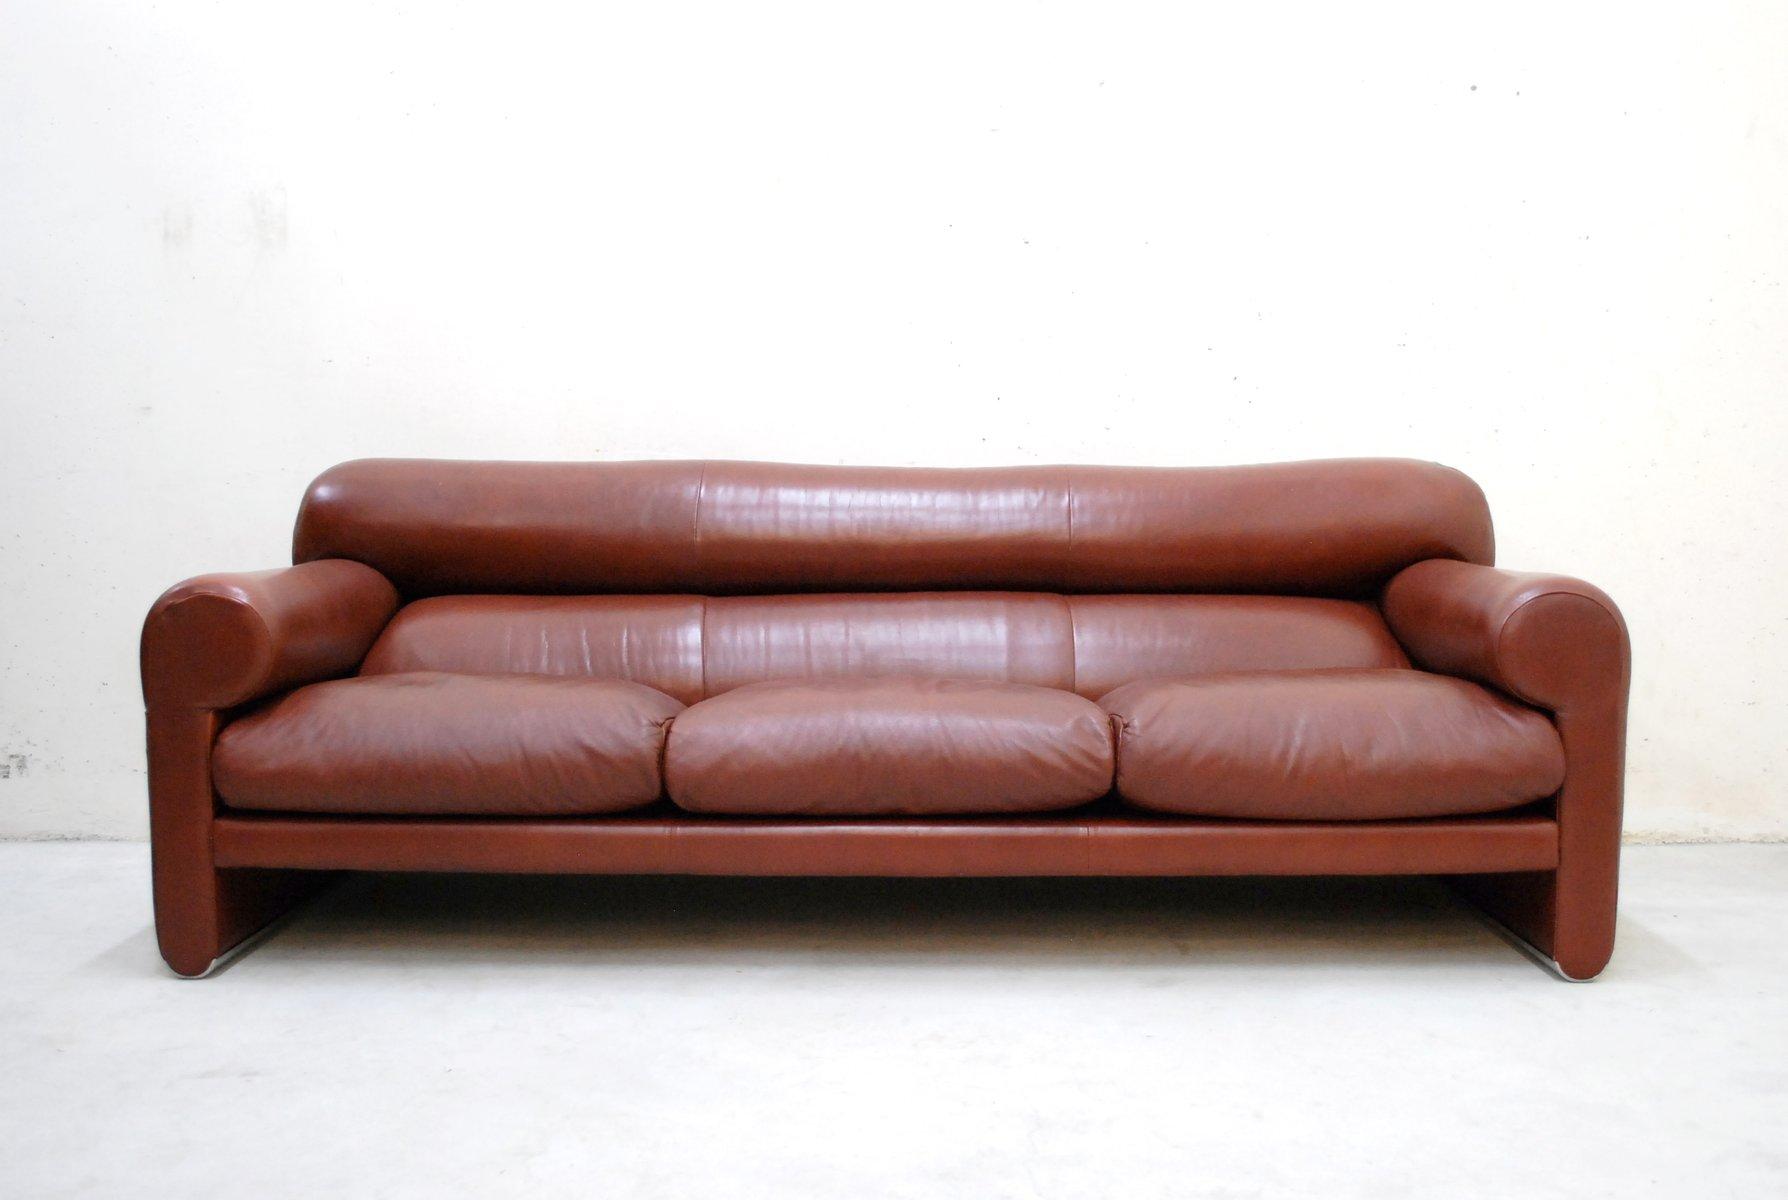 italienisches ledersofa von sergio mazza und giuliana gramigna f r poltrona frau bei pamono kaufen. Black Bedroom Furniture Sets. Home Design Ideas